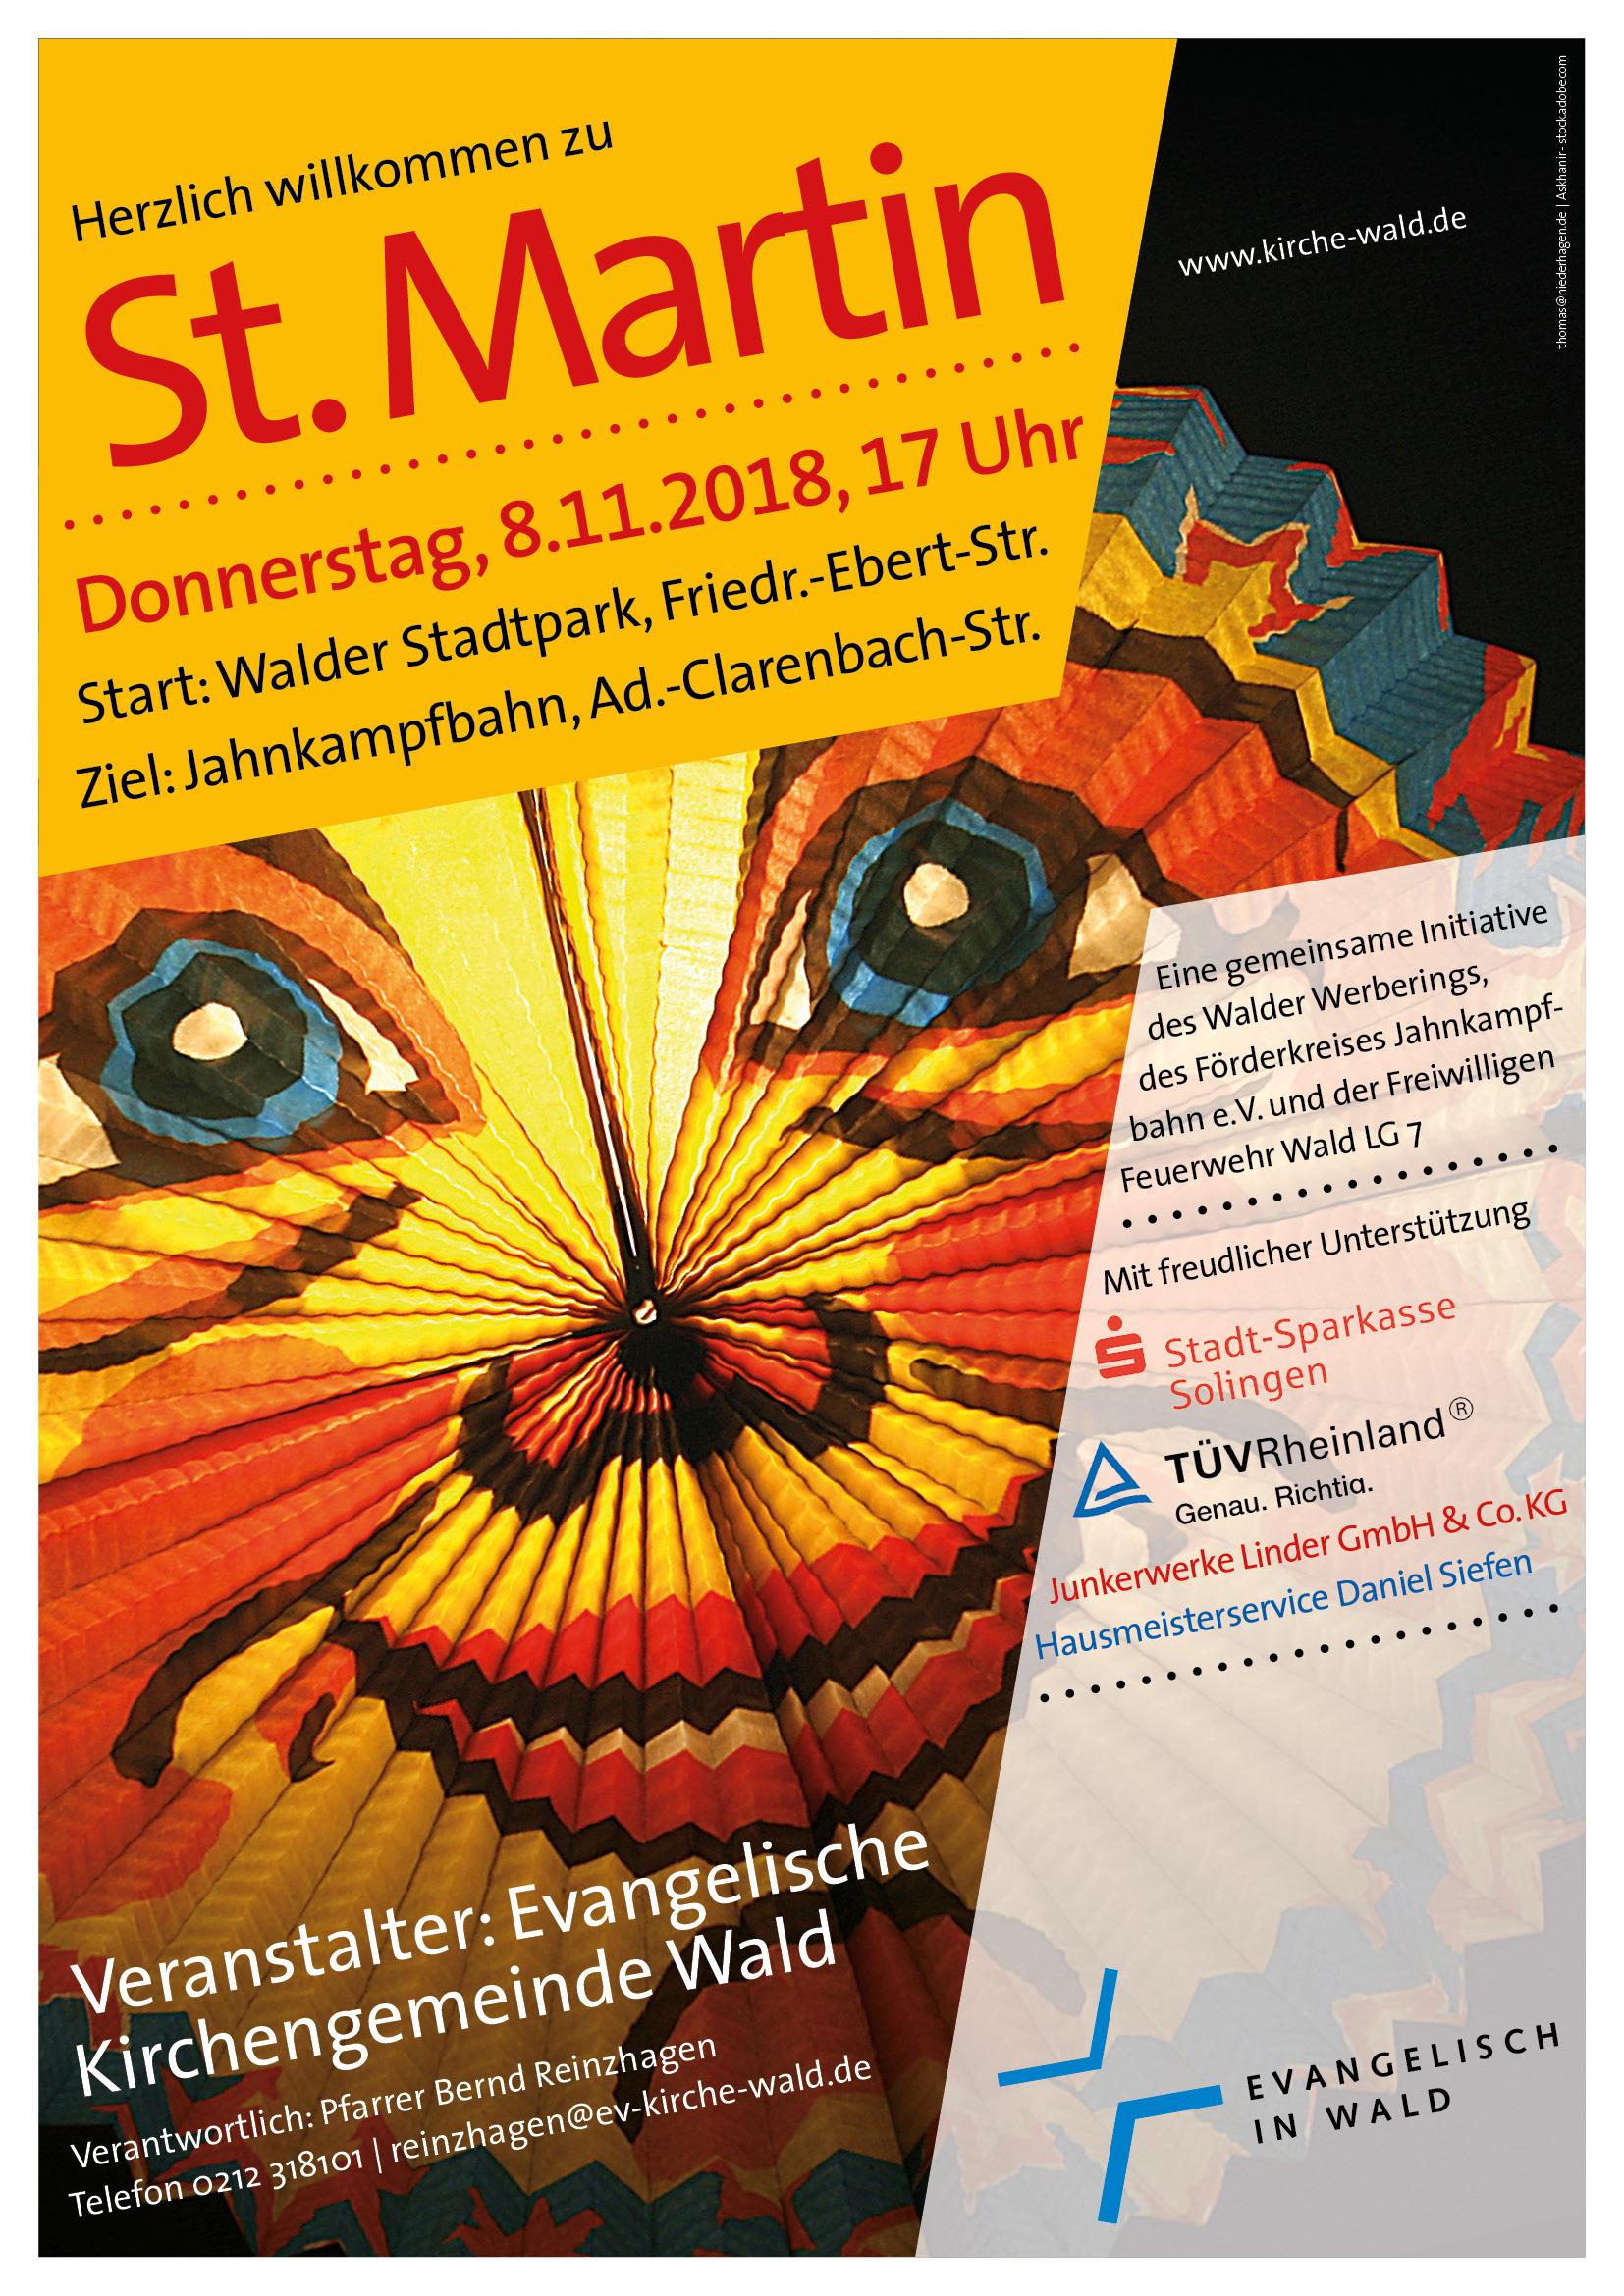 St Martin Solingen Wald 2018